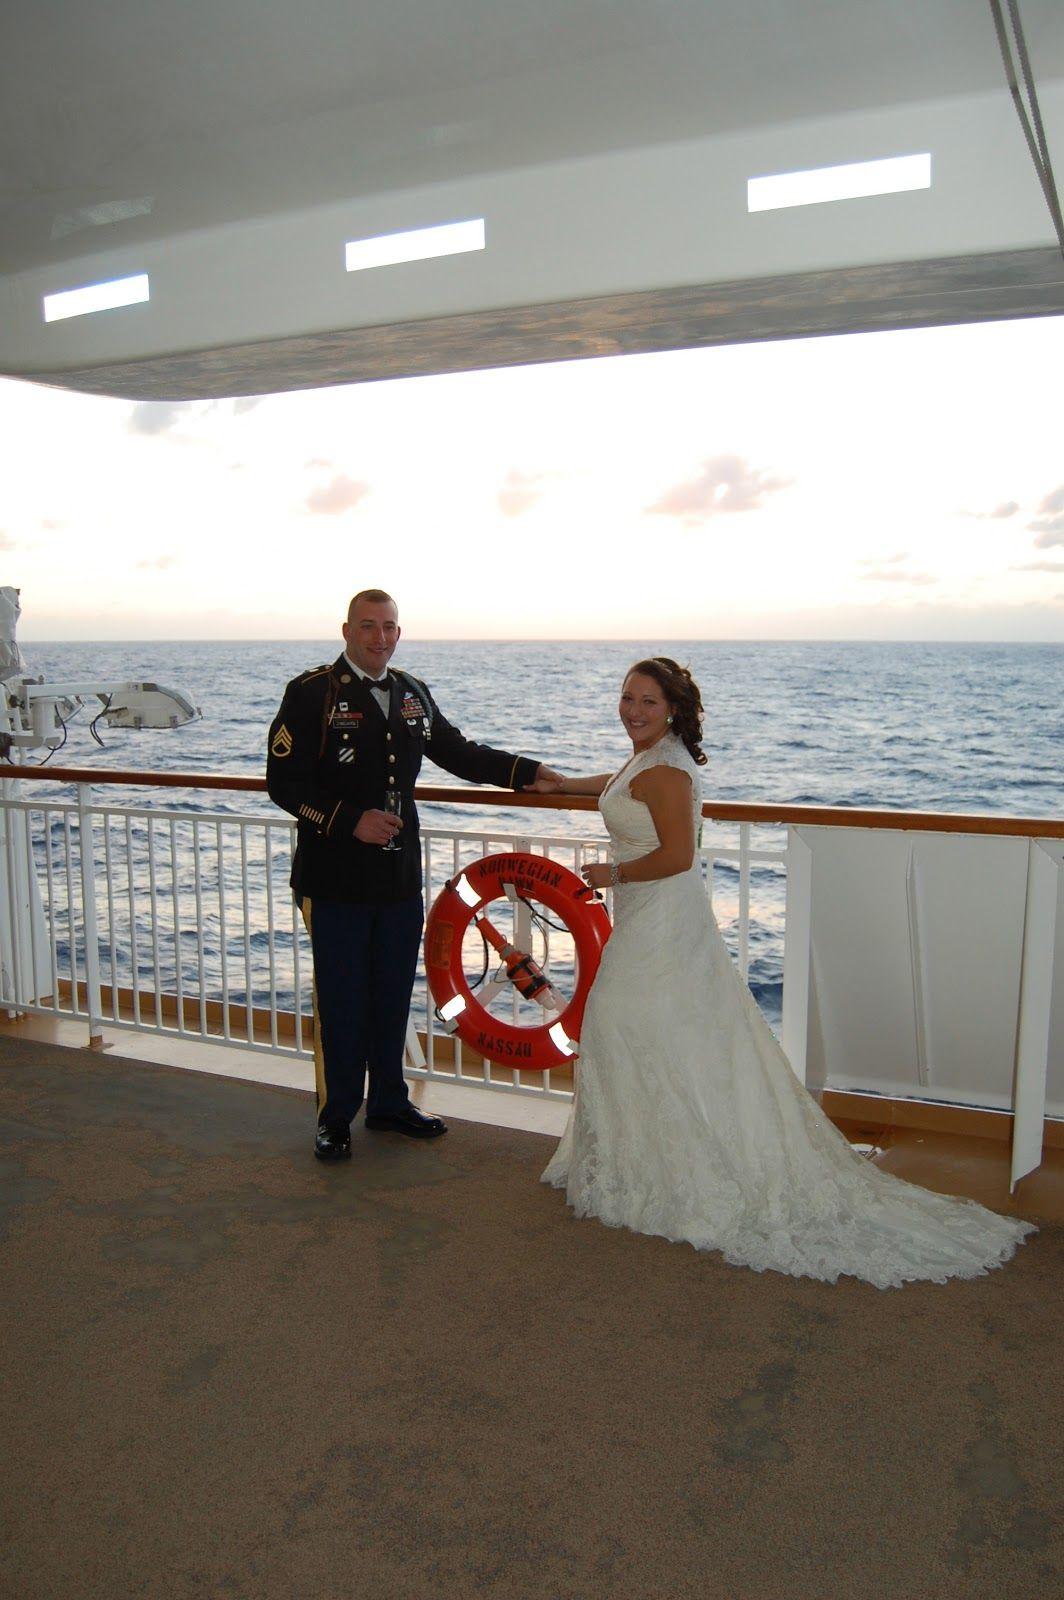 Bright Old Beginnings Cruise ship wedding, Honeymoon